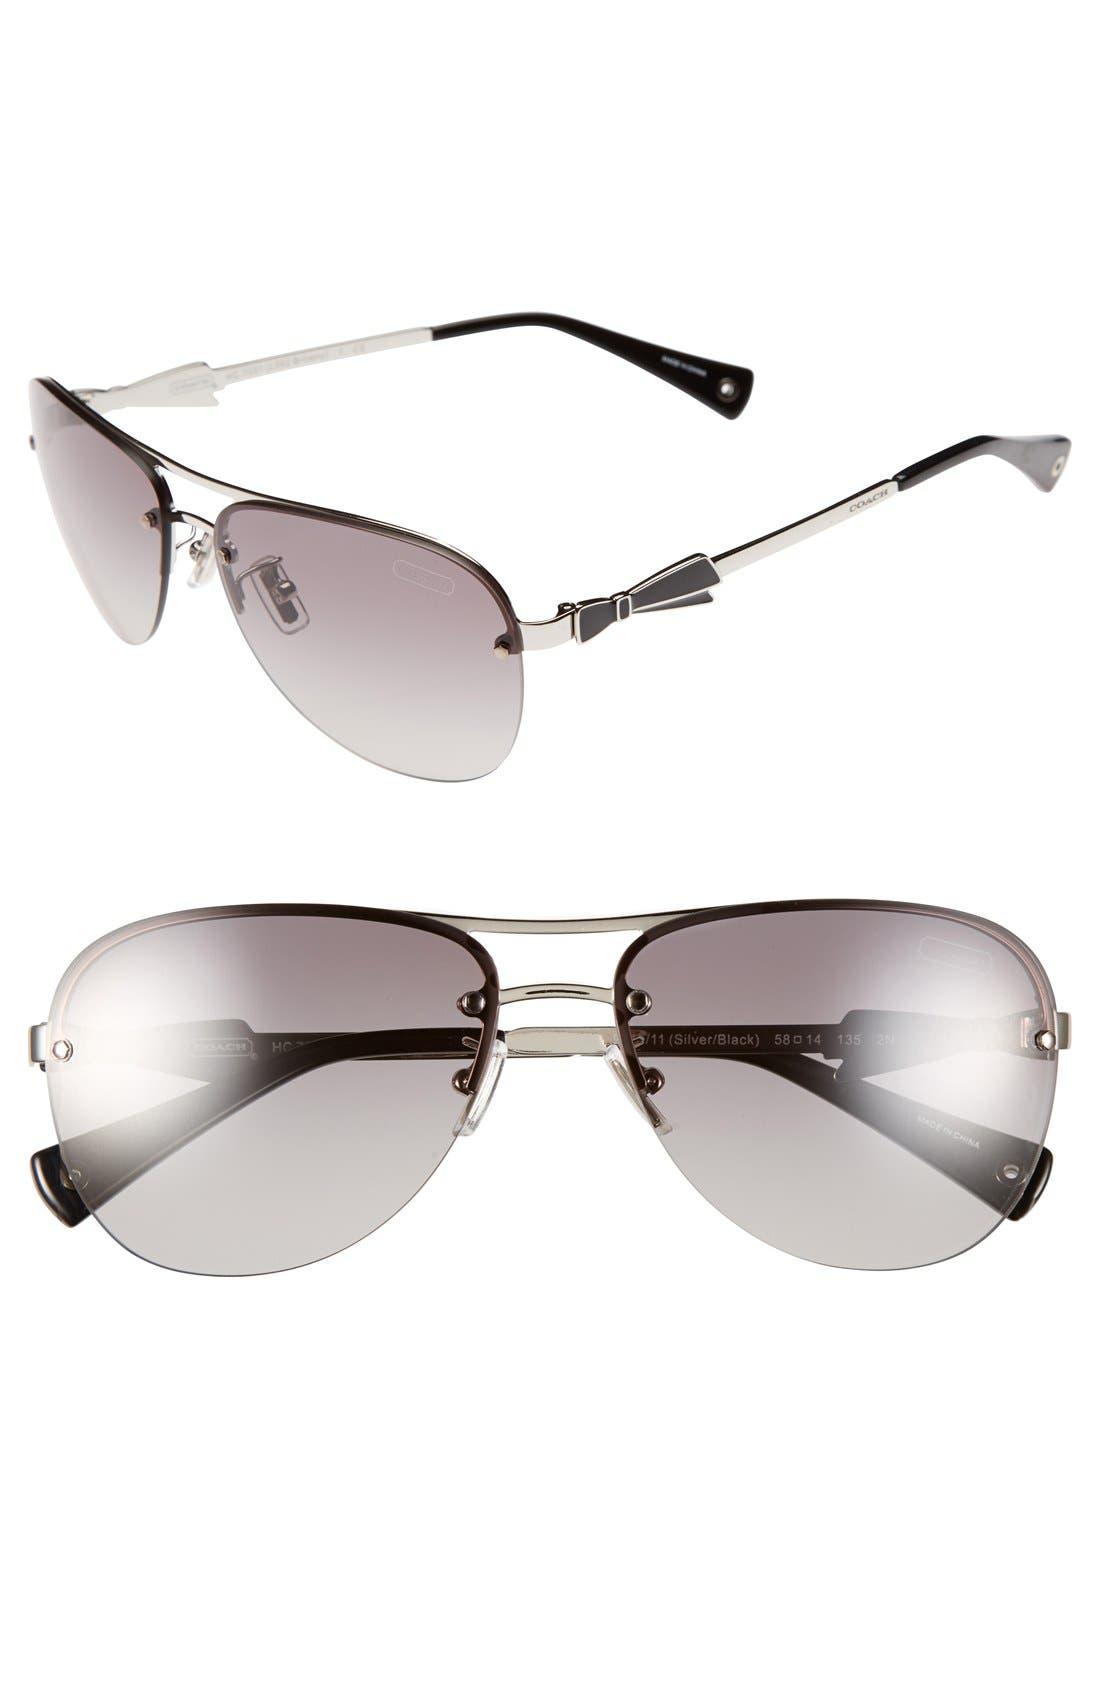 Main Image - COACH 58mm Aviator Sunglasses